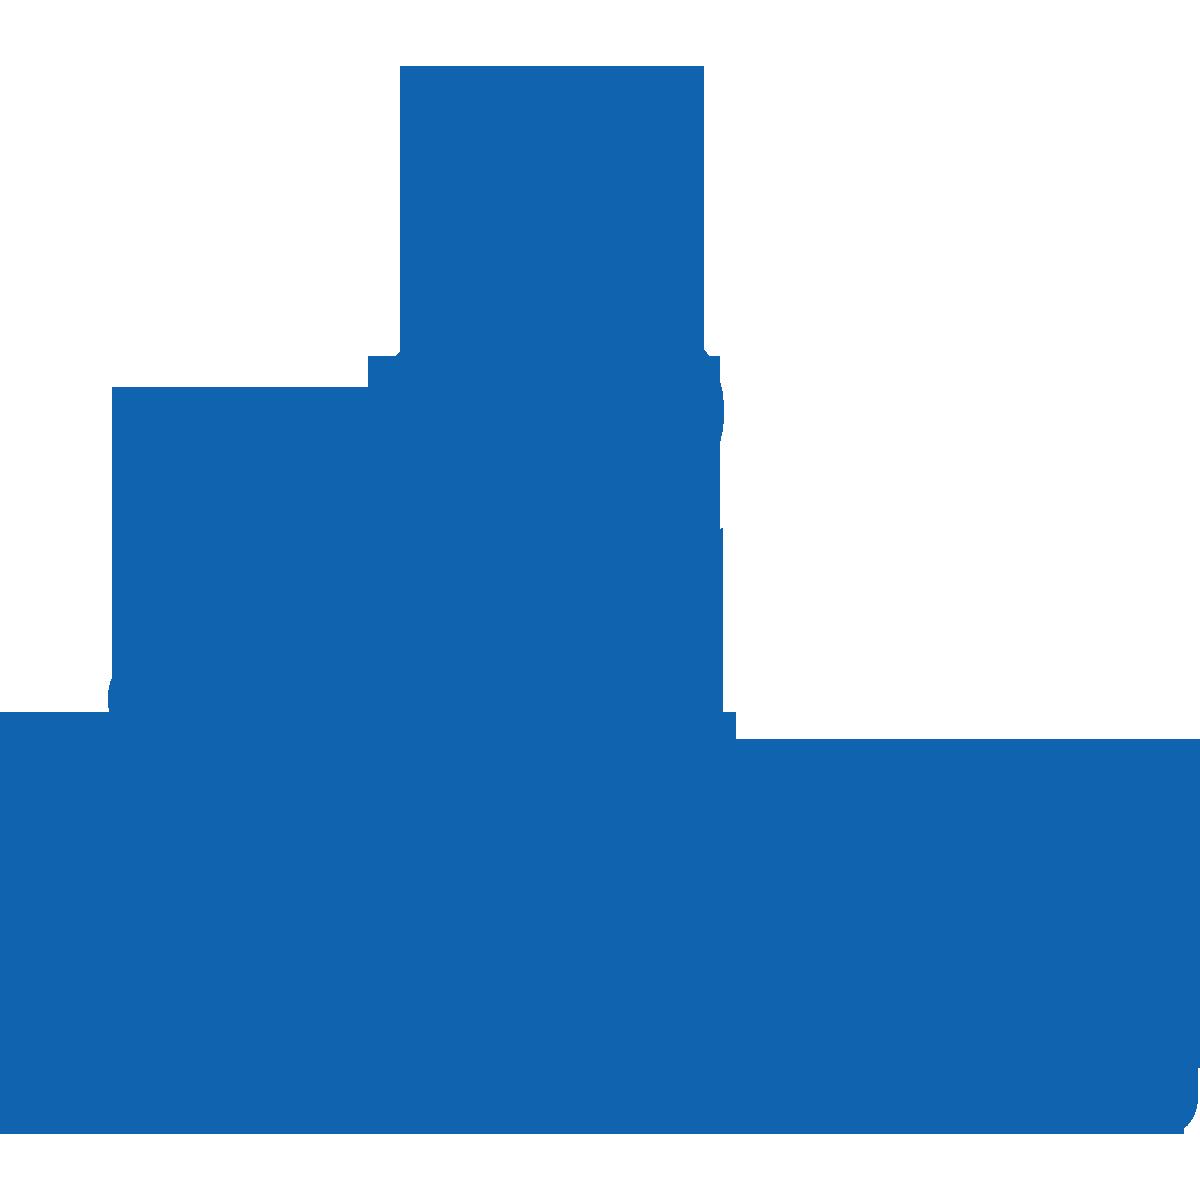 banner download Rezultat iskanja slik za. Therapy clipart acupressure